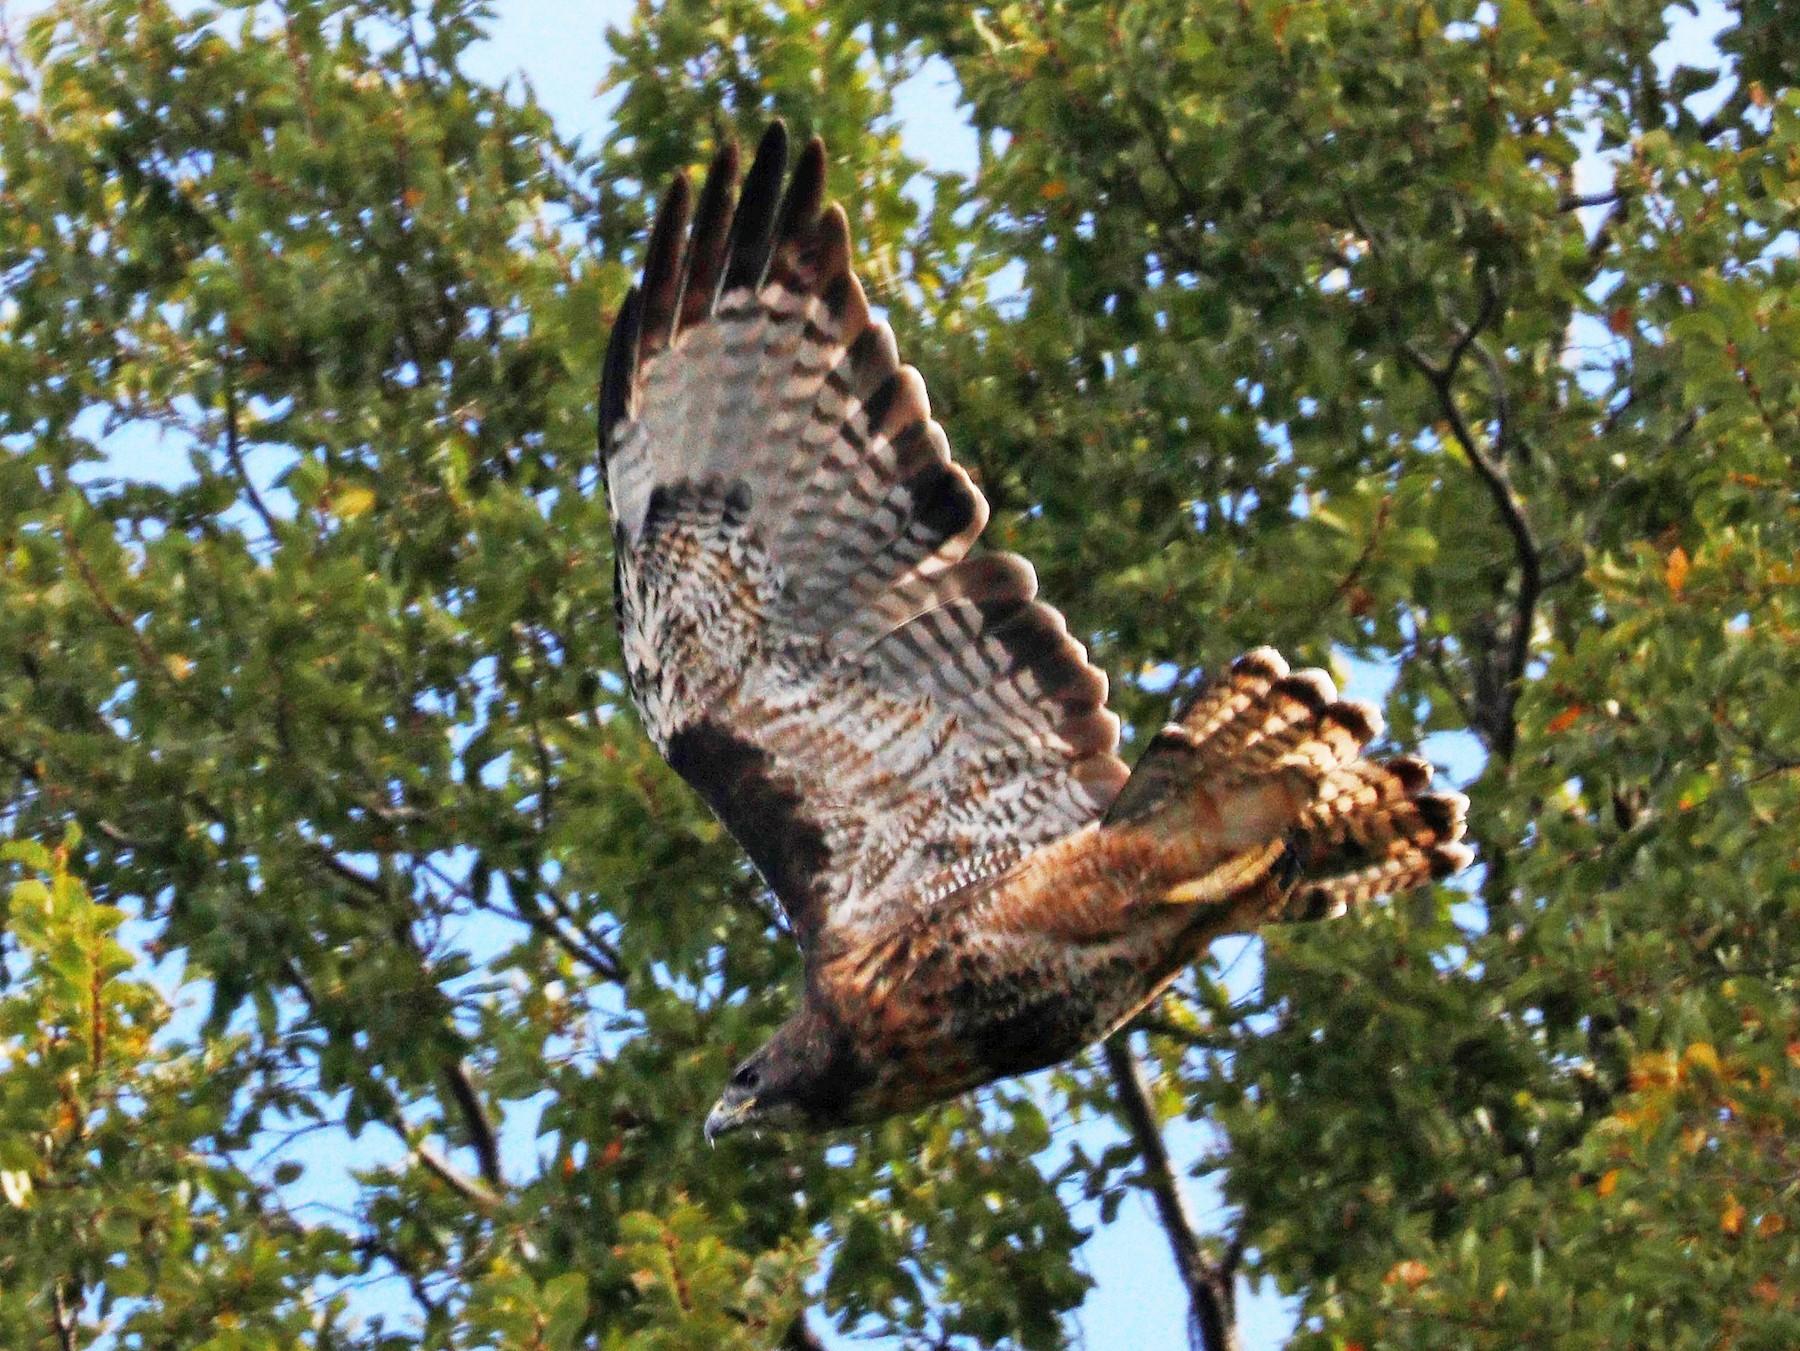 Rufous-tailed Hawk - Cecilia de Larminat